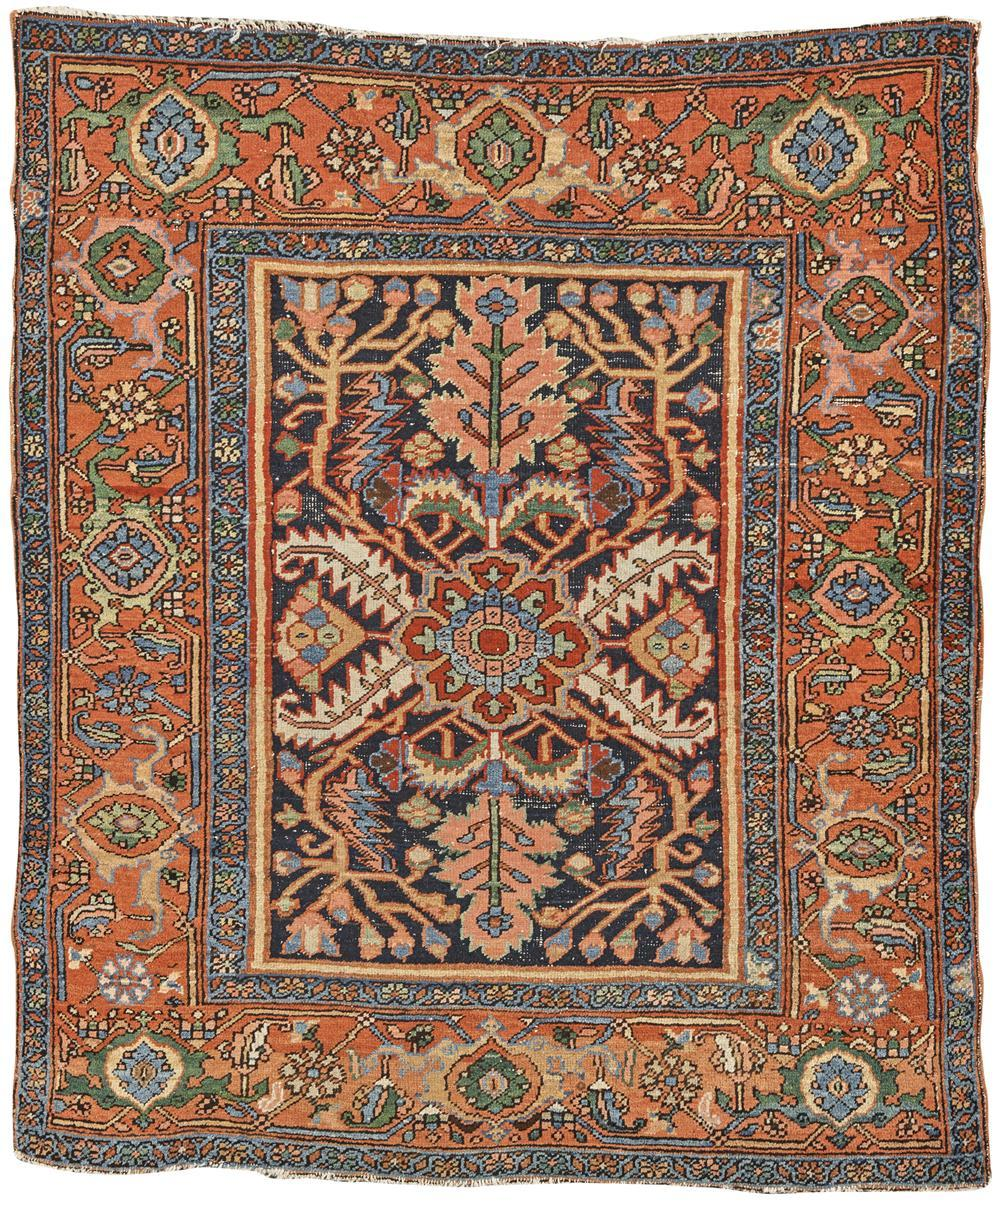 Heriz Rug, Persia, ca. 1910; 5 ft. 8 in. x 4 ft. 9 in.